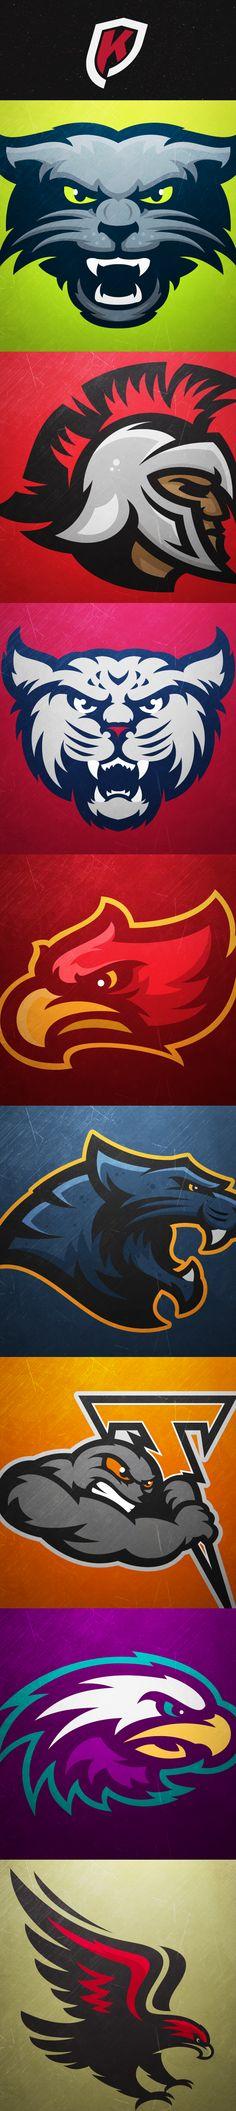 Sport Logo Design Icons Behance 67 New Ideas Sports Team Logos, Mascot Design, Branding, Badge Logo, Logo Concept, Animal Logo, Illustrations, Cool Logo, Art Logo